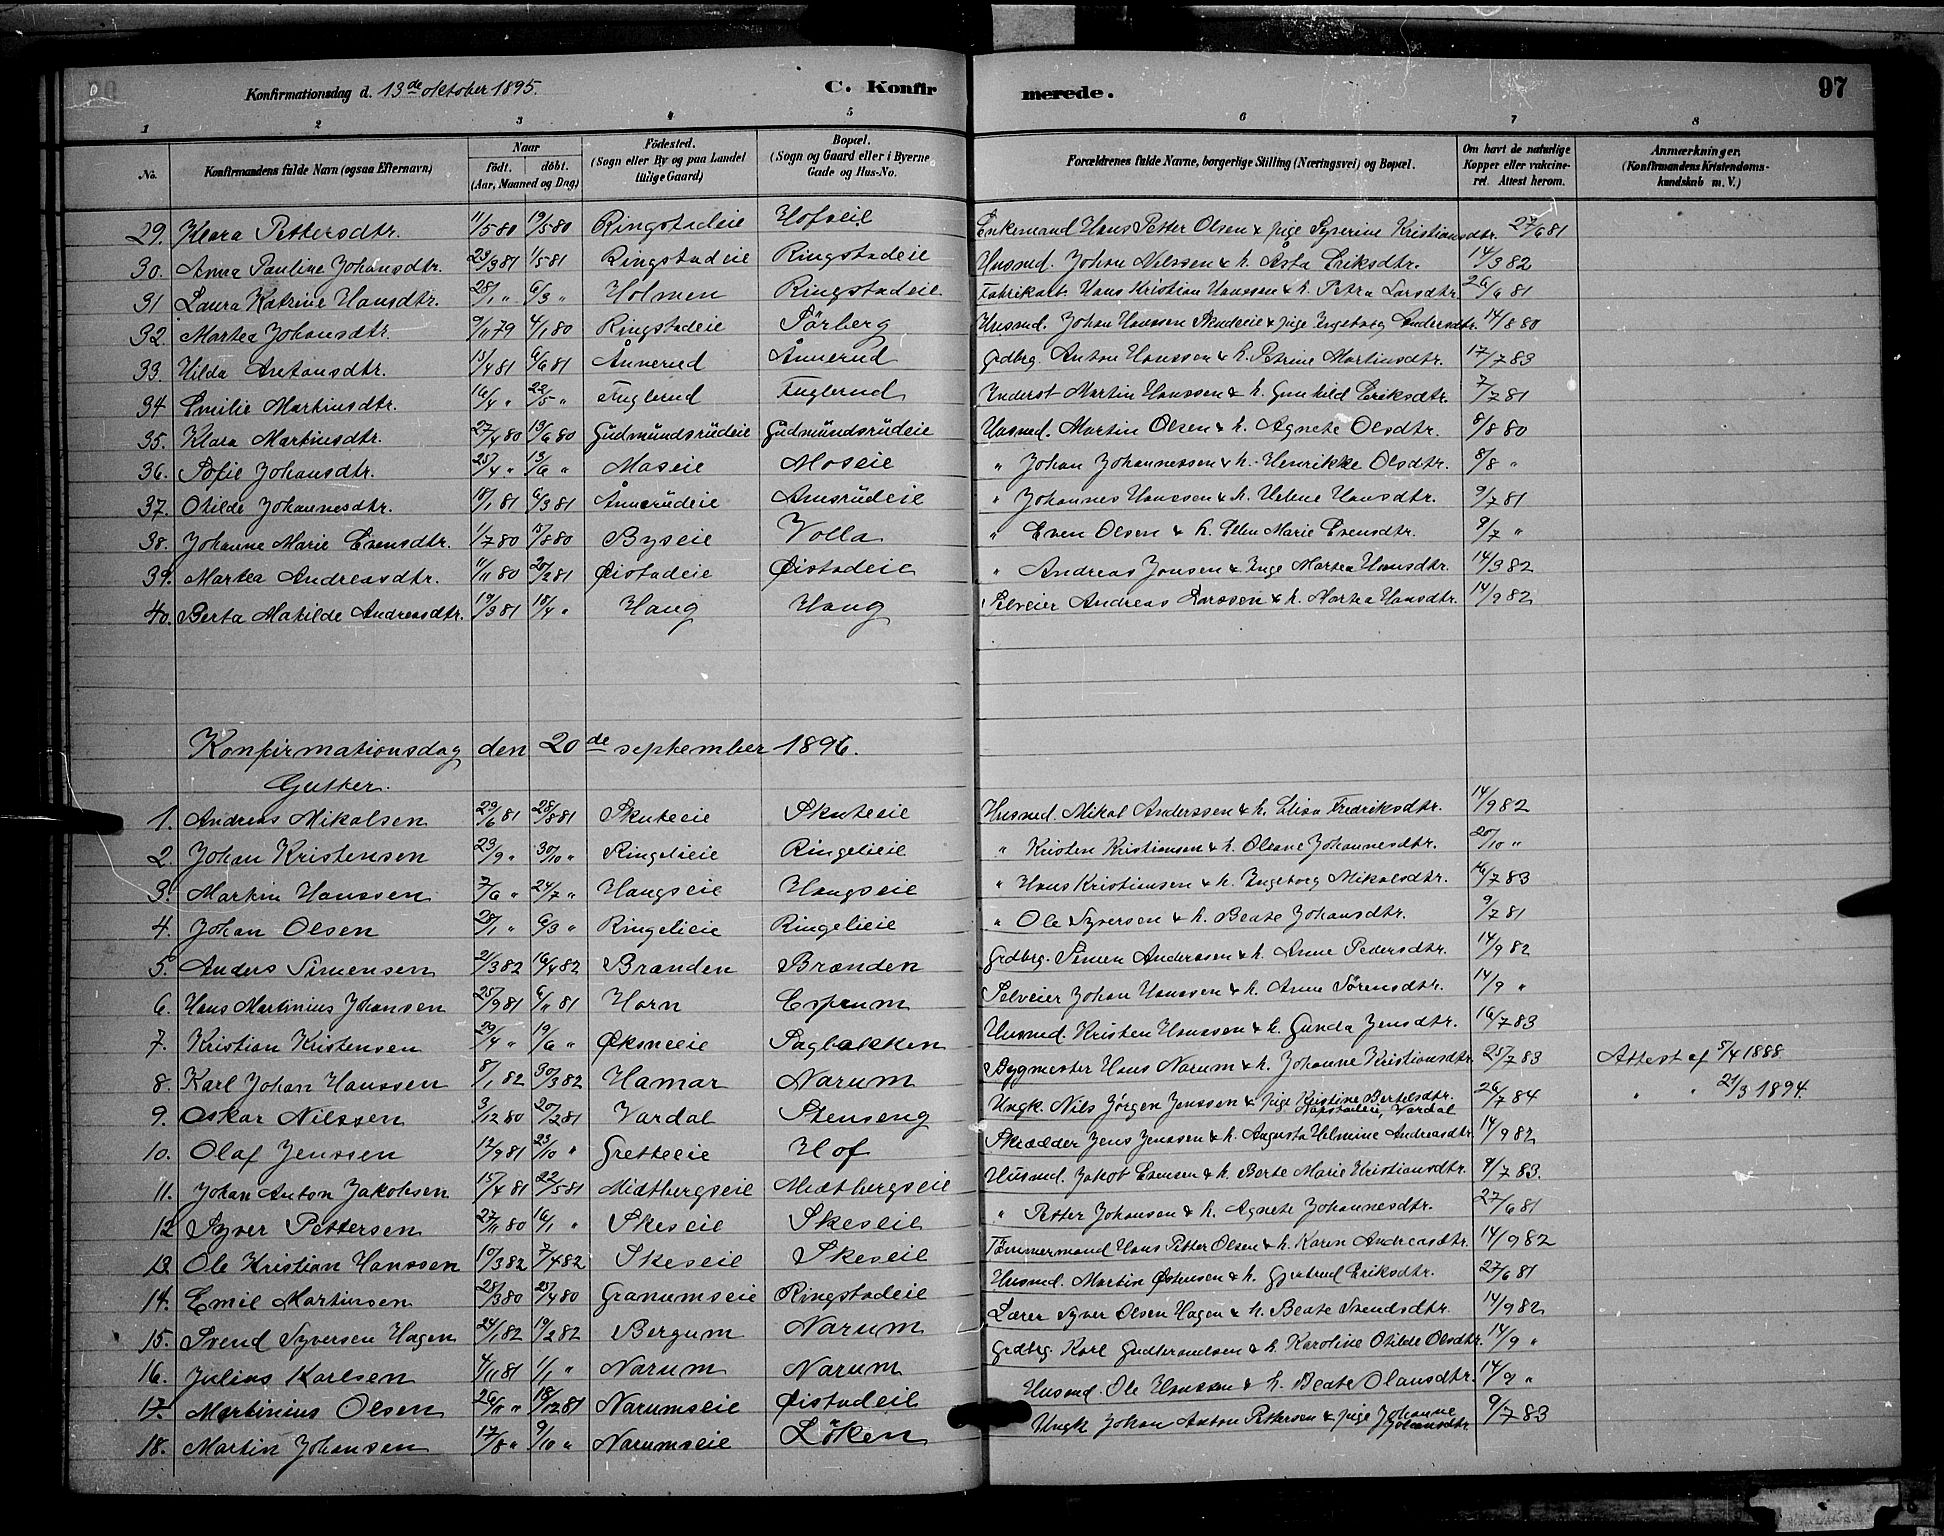 SAH, Søndre Land prestekontor, L/L0002: Klokkerbok nr. 2, 1884-1900, s. 97